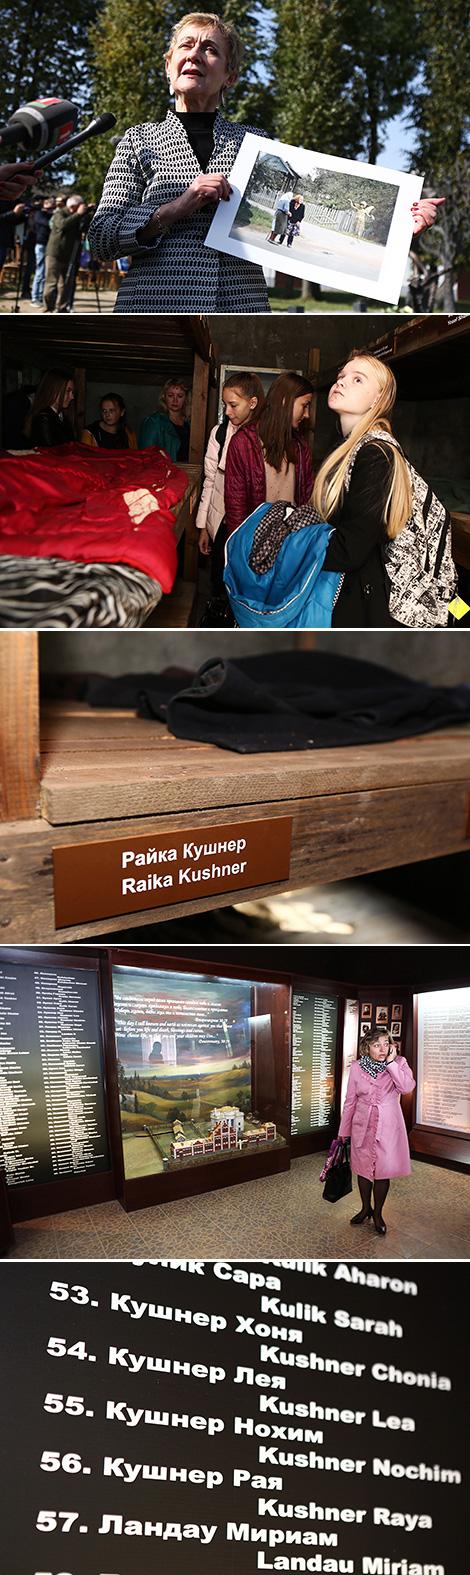 Monument to mark mass ghetto escape unveiled in Novogrudok